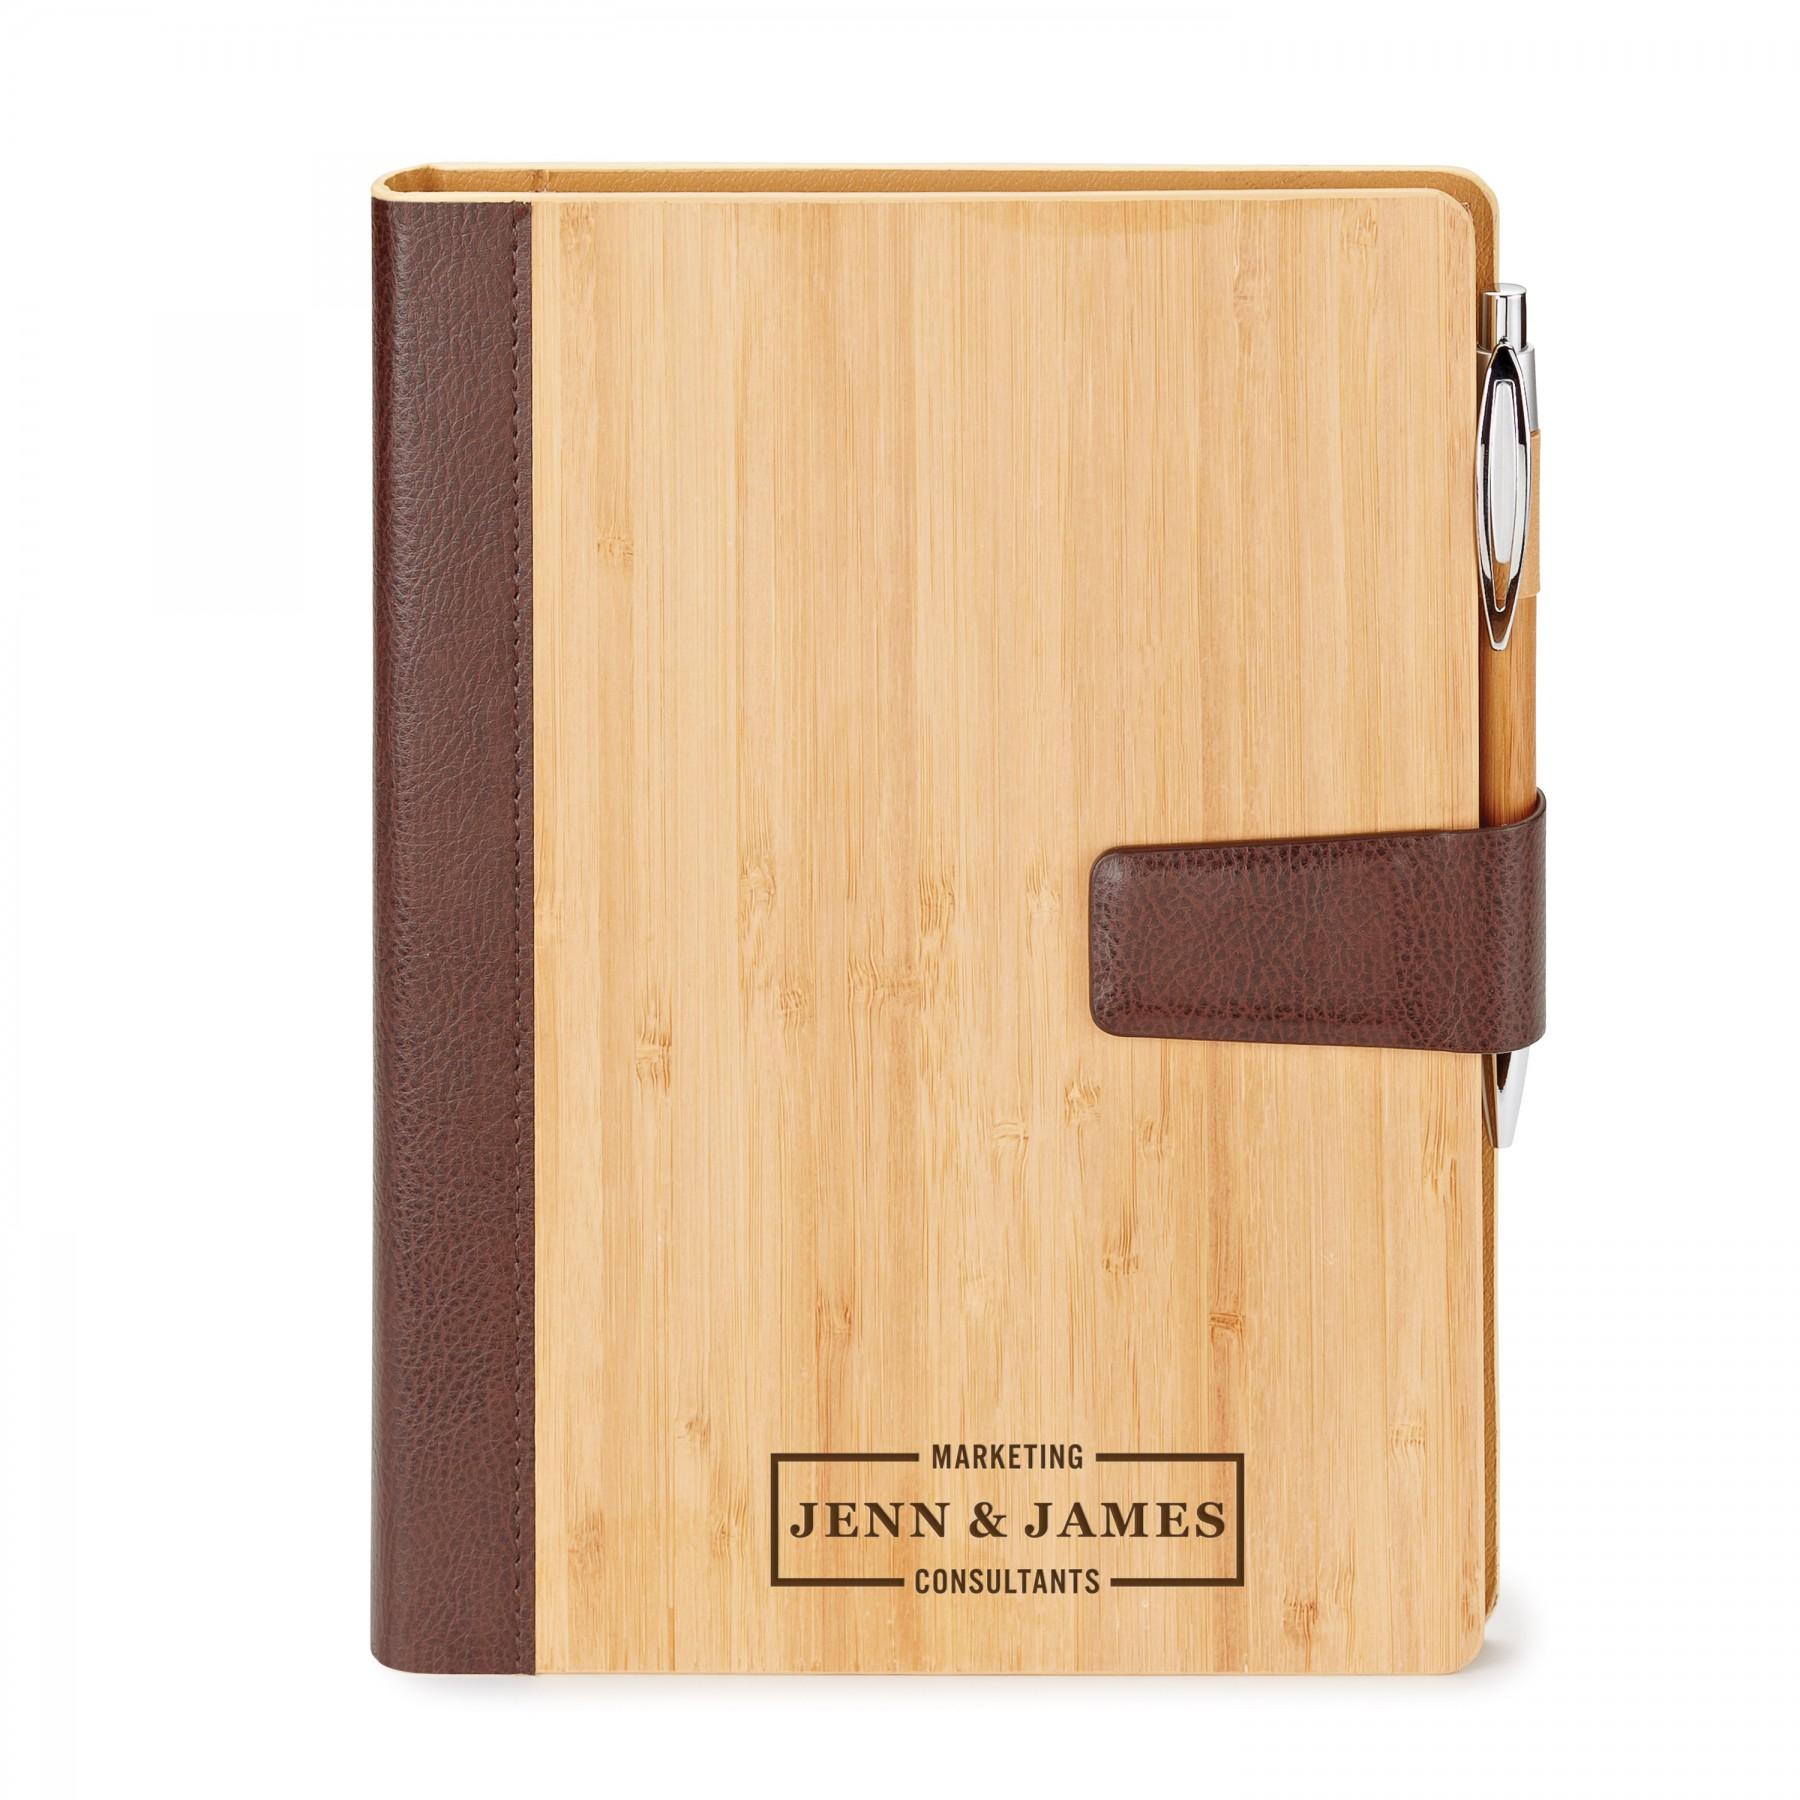 Bamboo Refillable Journal, EC3069, Laser Engraved